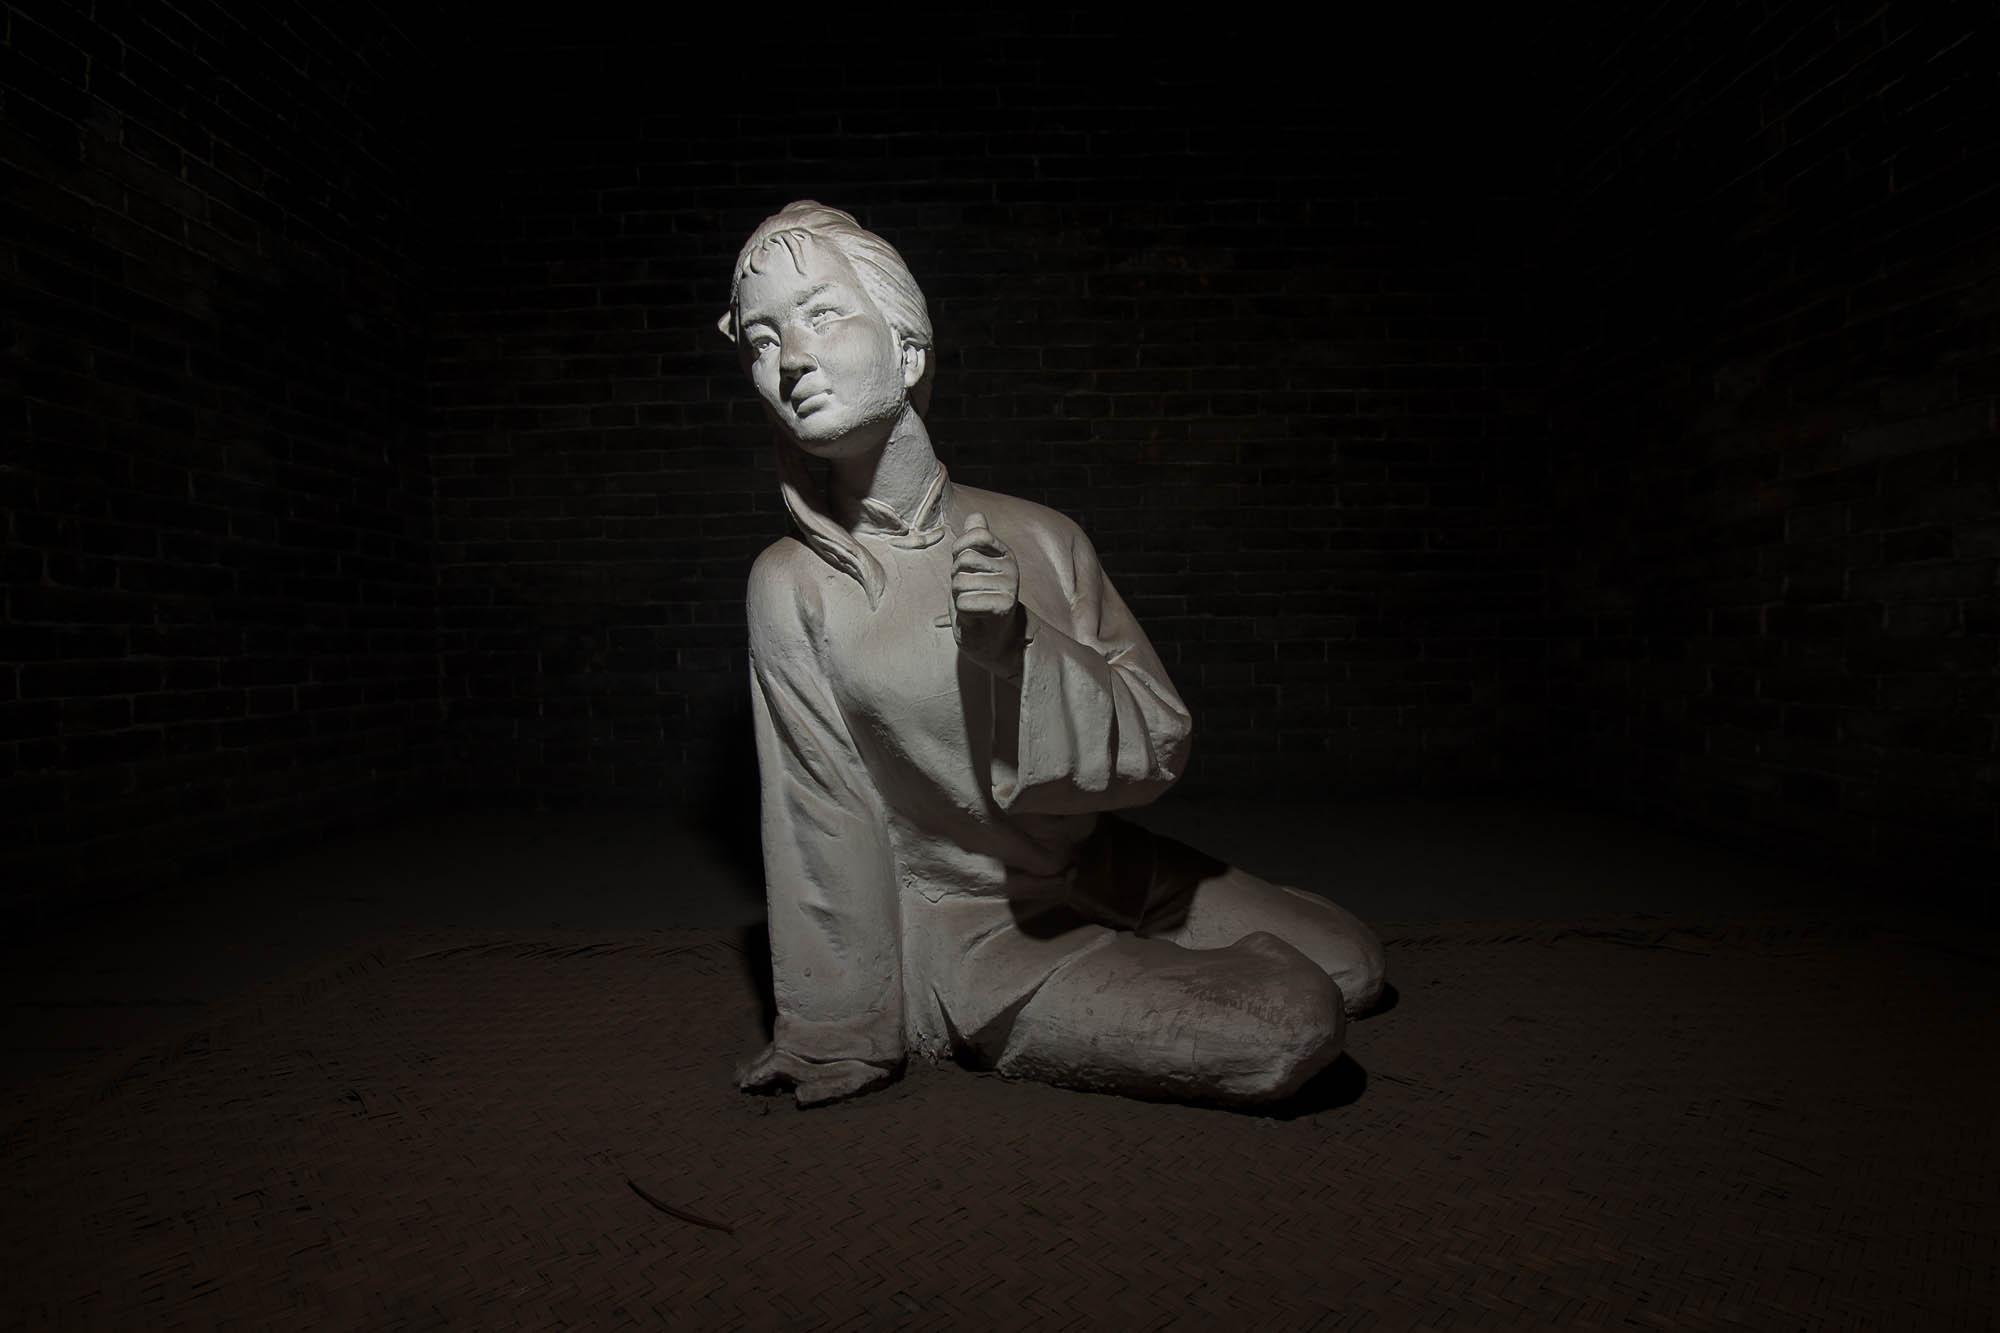 Susan statue